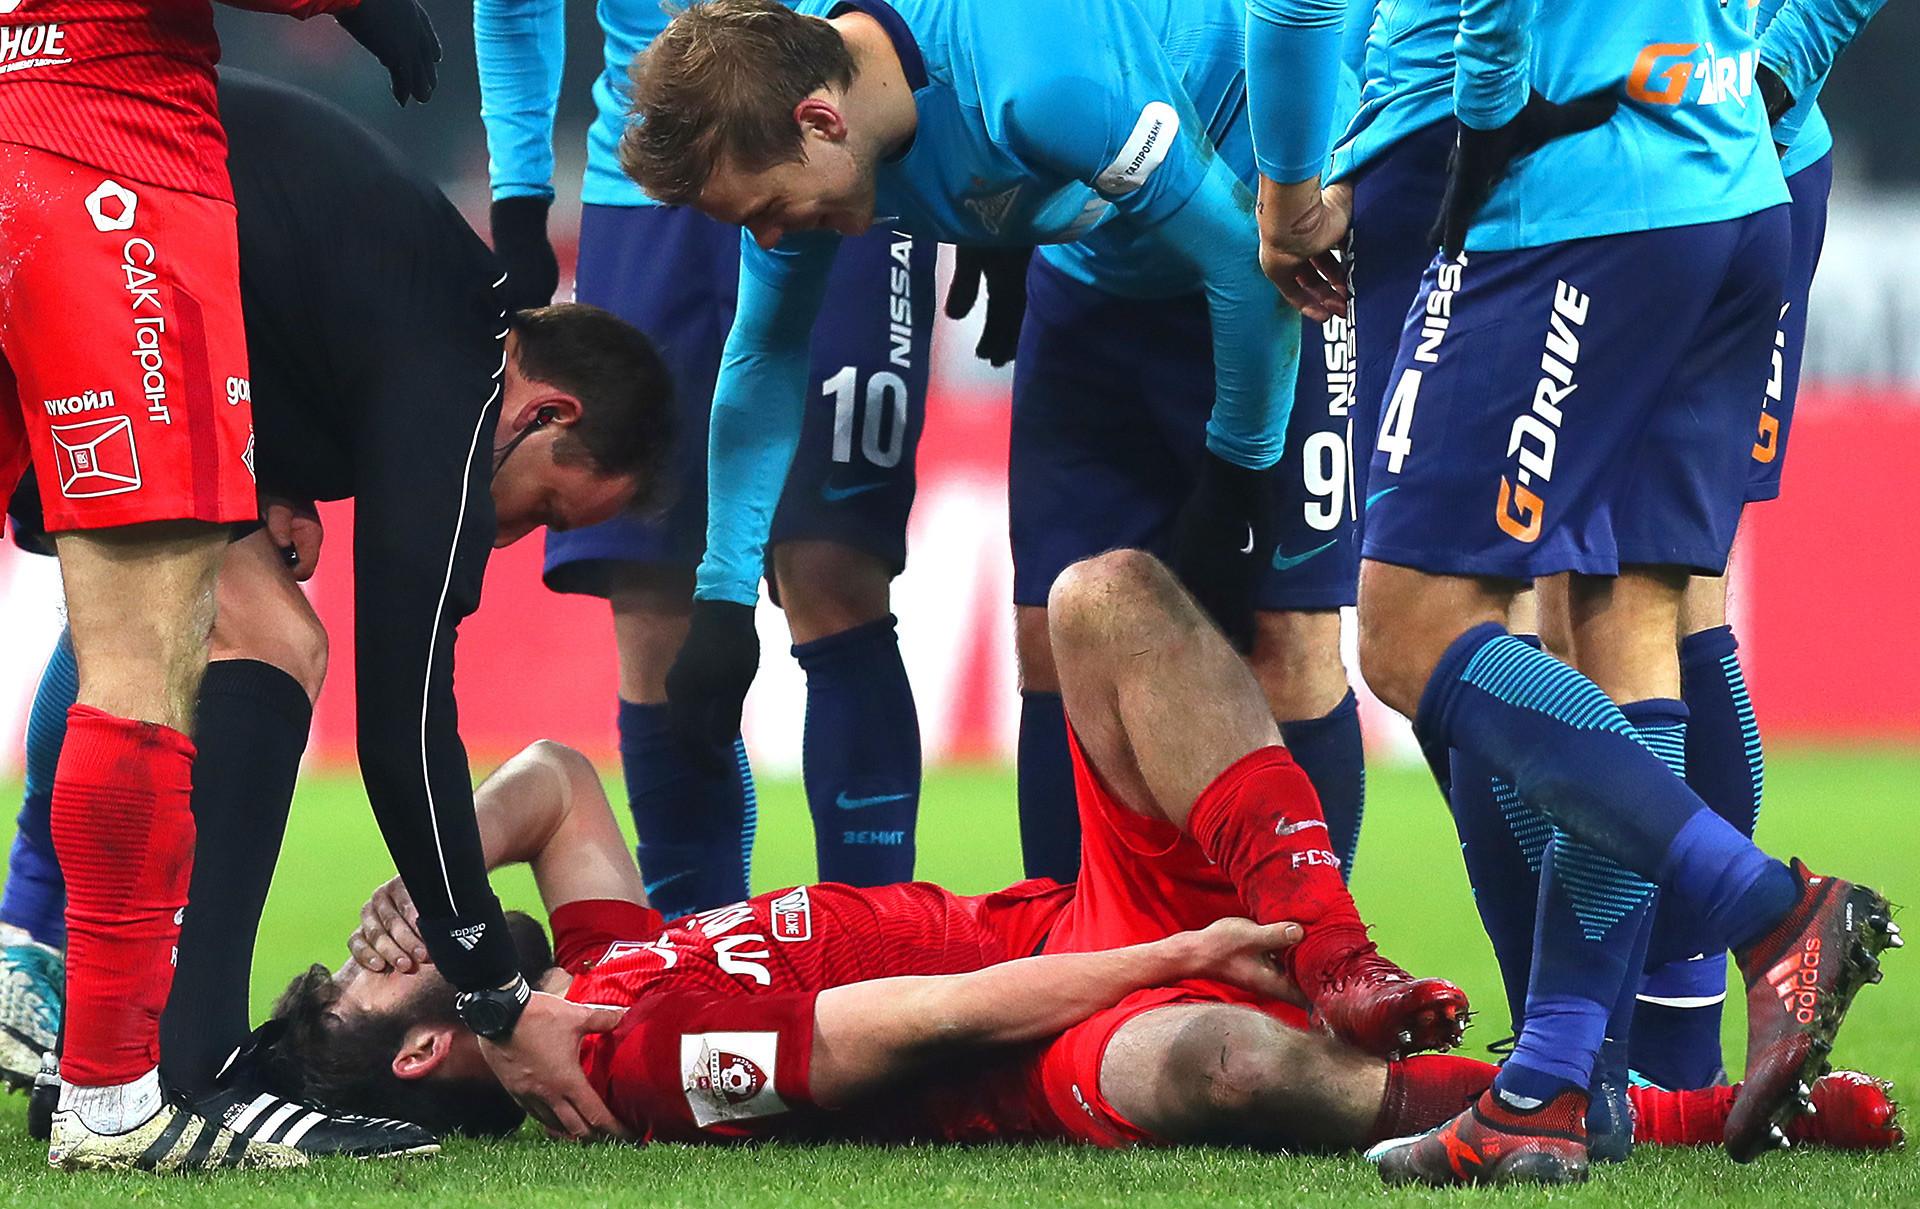 Anggota timnas Georgi Dzhikiya kemungkinan akan absen pada laga Piala Dunia menyusul cedera ligamen yang ia derita pada Januari lalu.